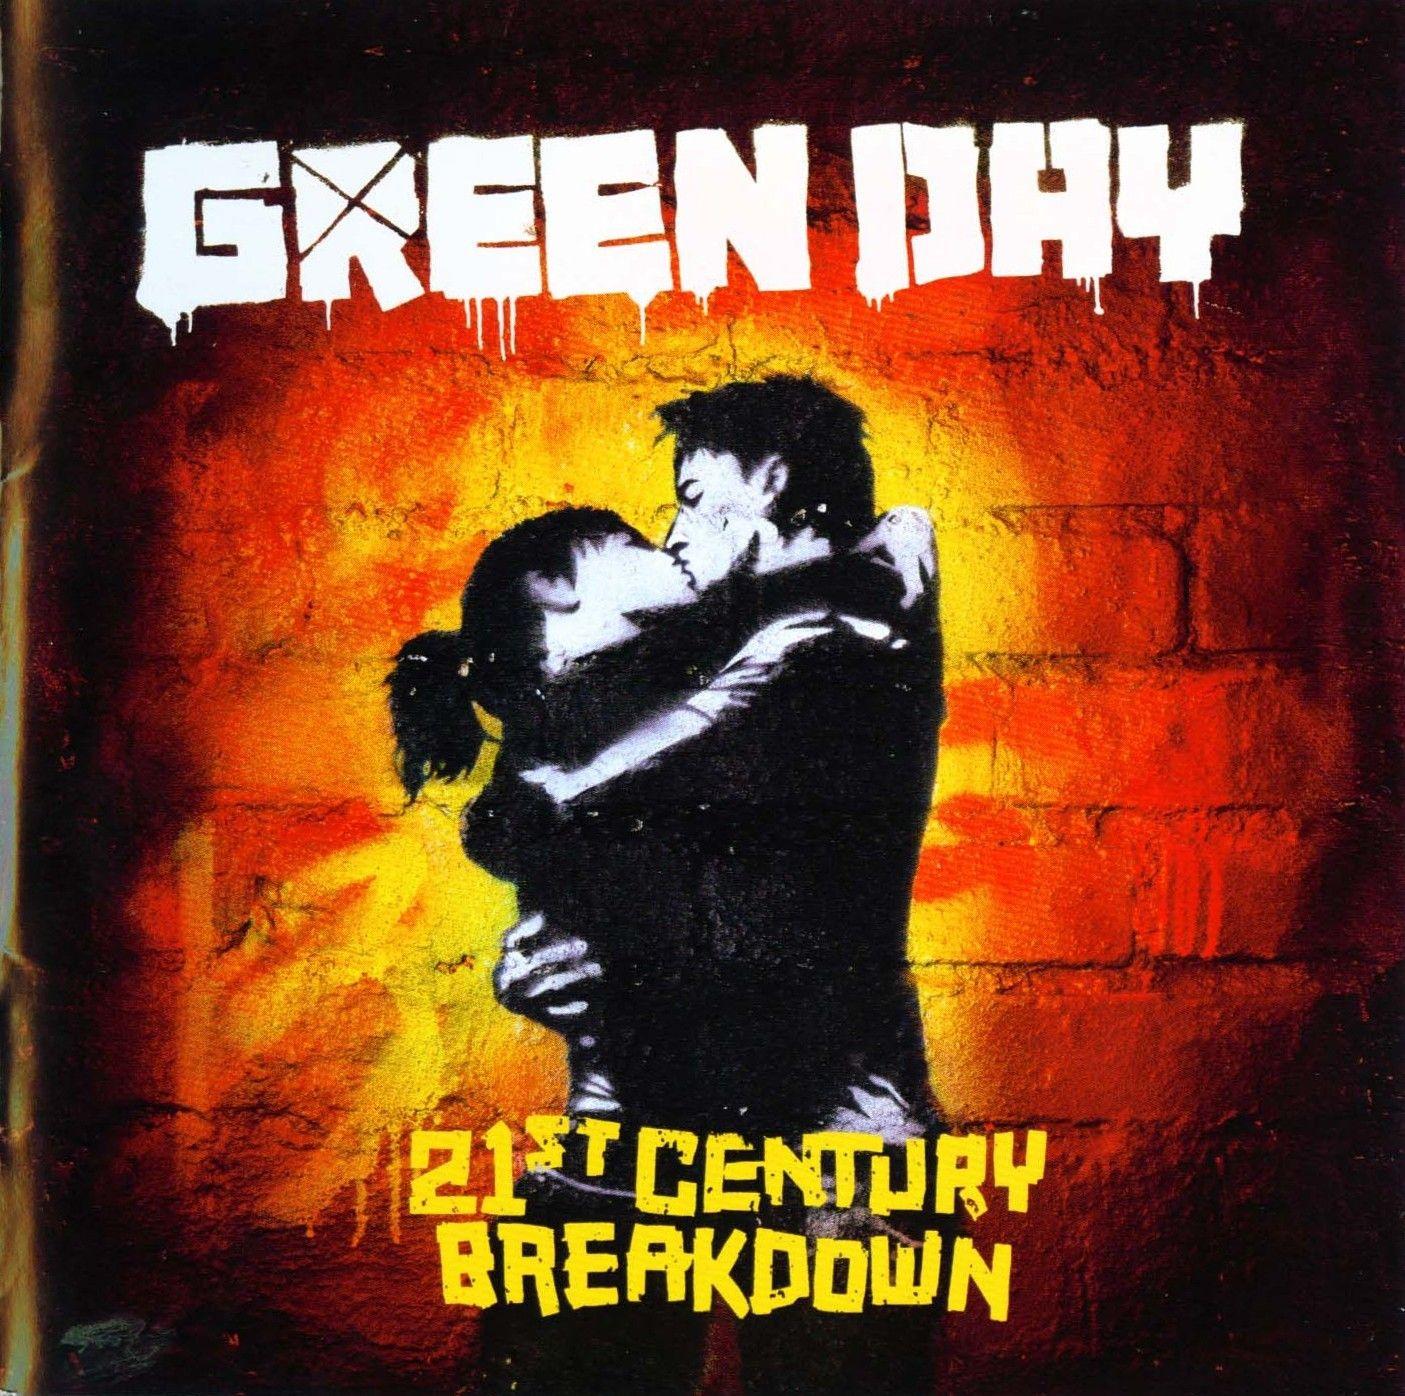 Green Day - 21st Century Breakdown album cover